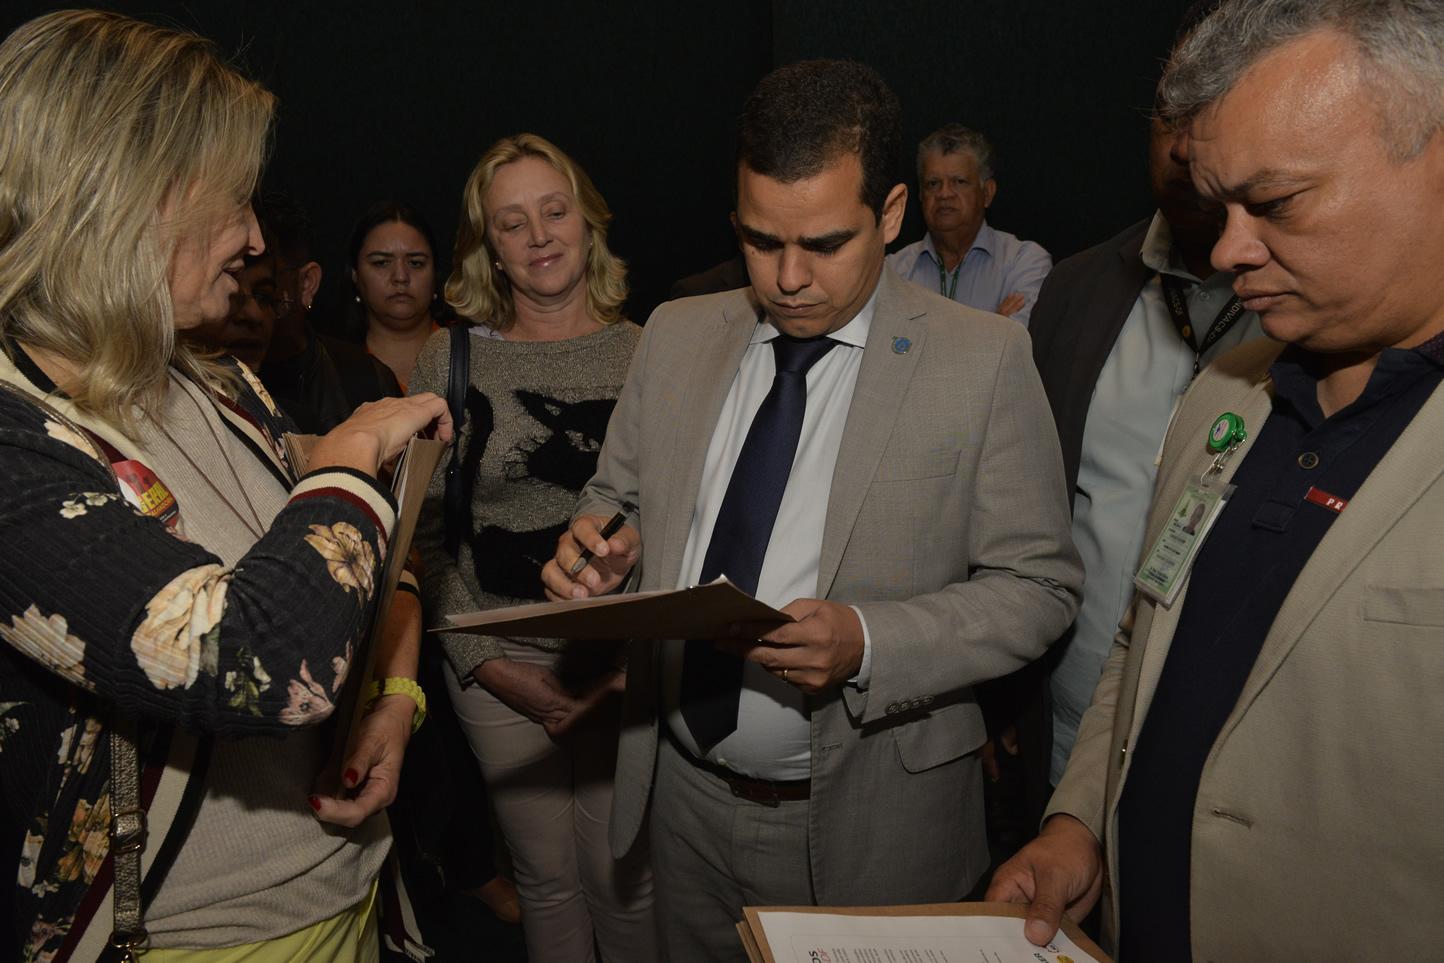 2019.06.13_Visita-aos-gabinetes-contra-o-fim-da-licenca-premio_fotos-Deva-Garcia-45